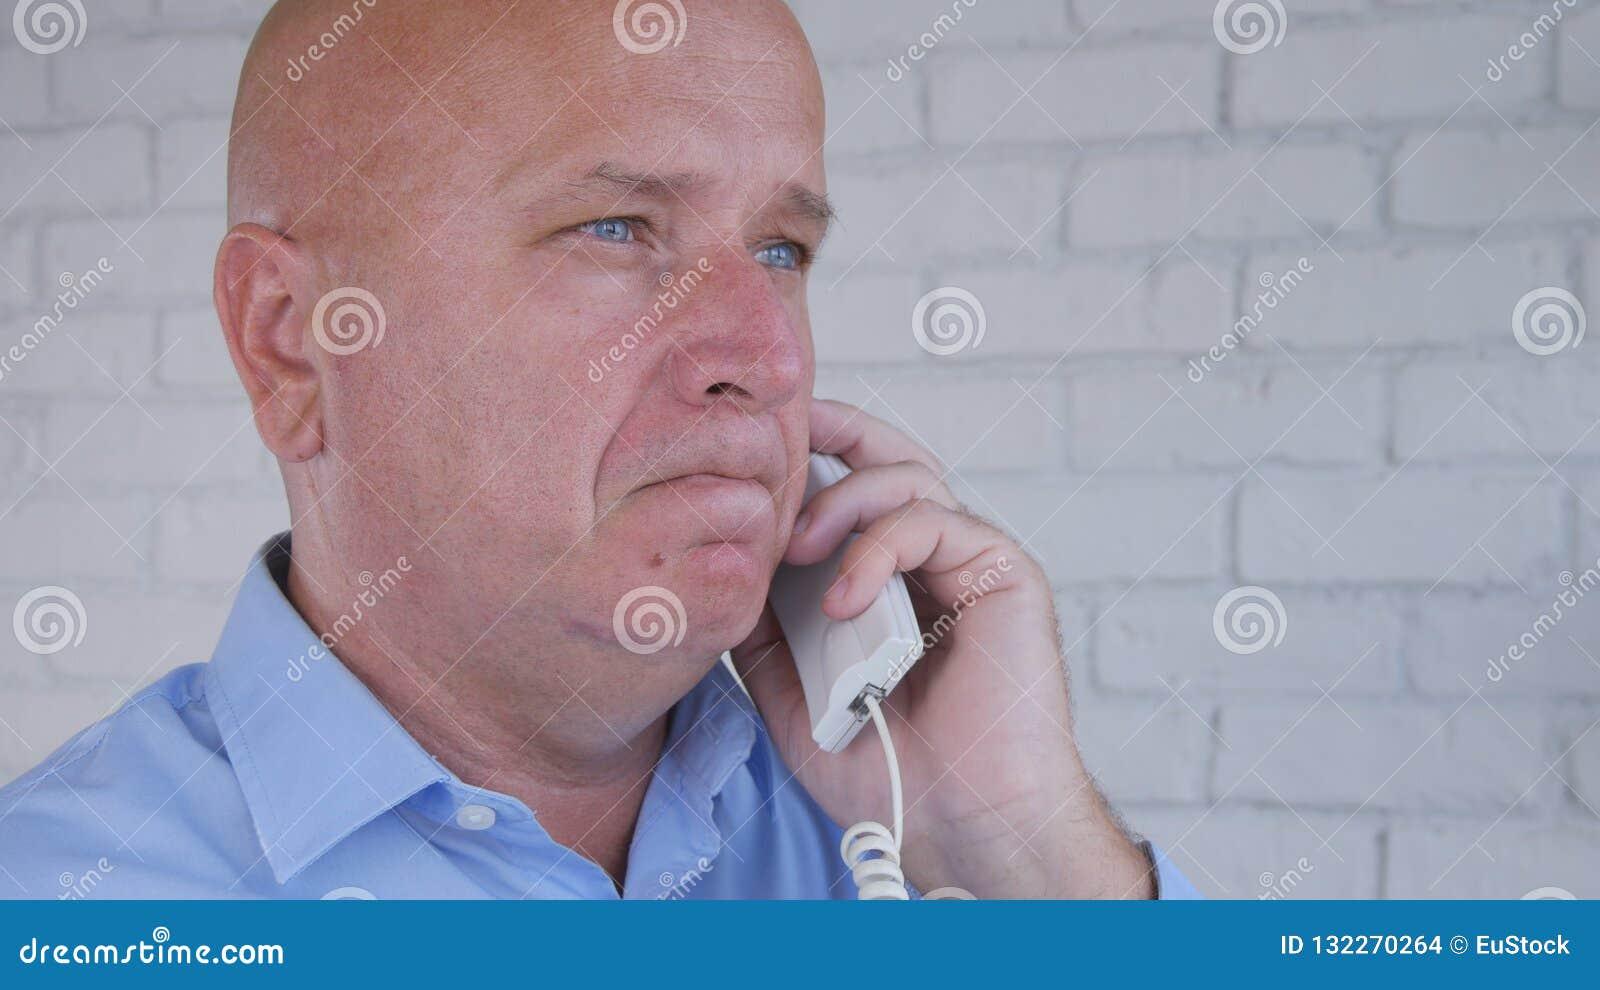 Businessman Image Talk Business Using Telephone Communication